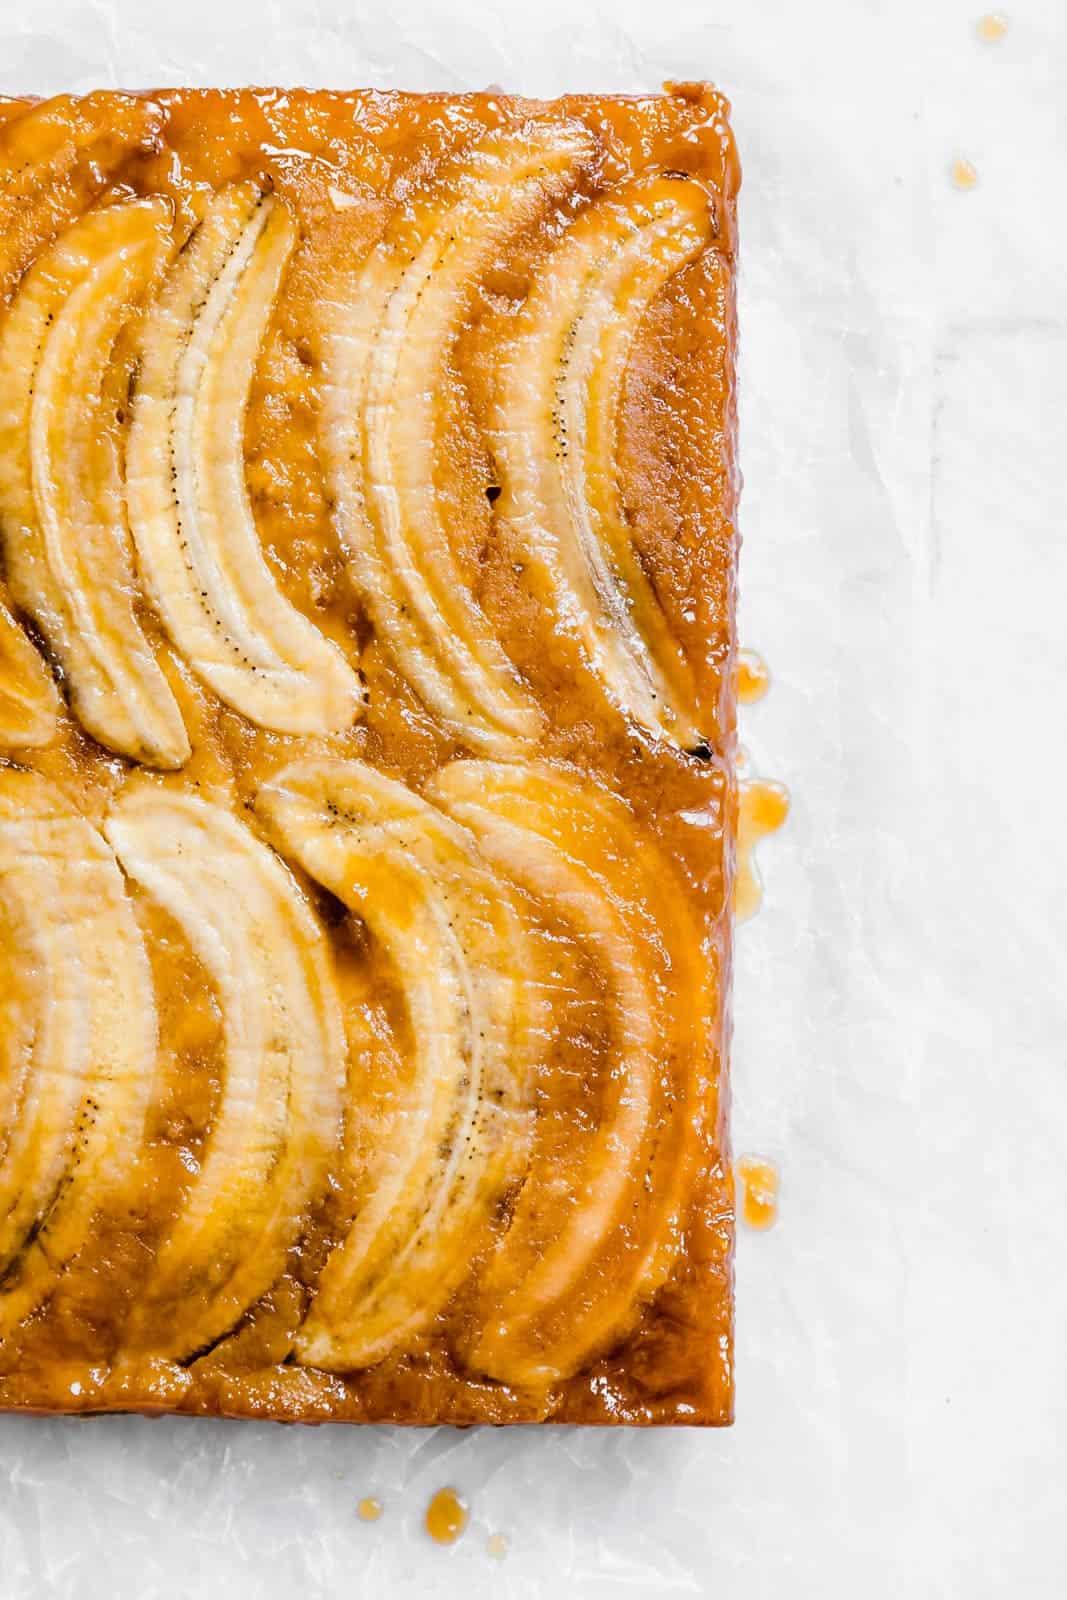 Banana Upside Down Cake on countertop